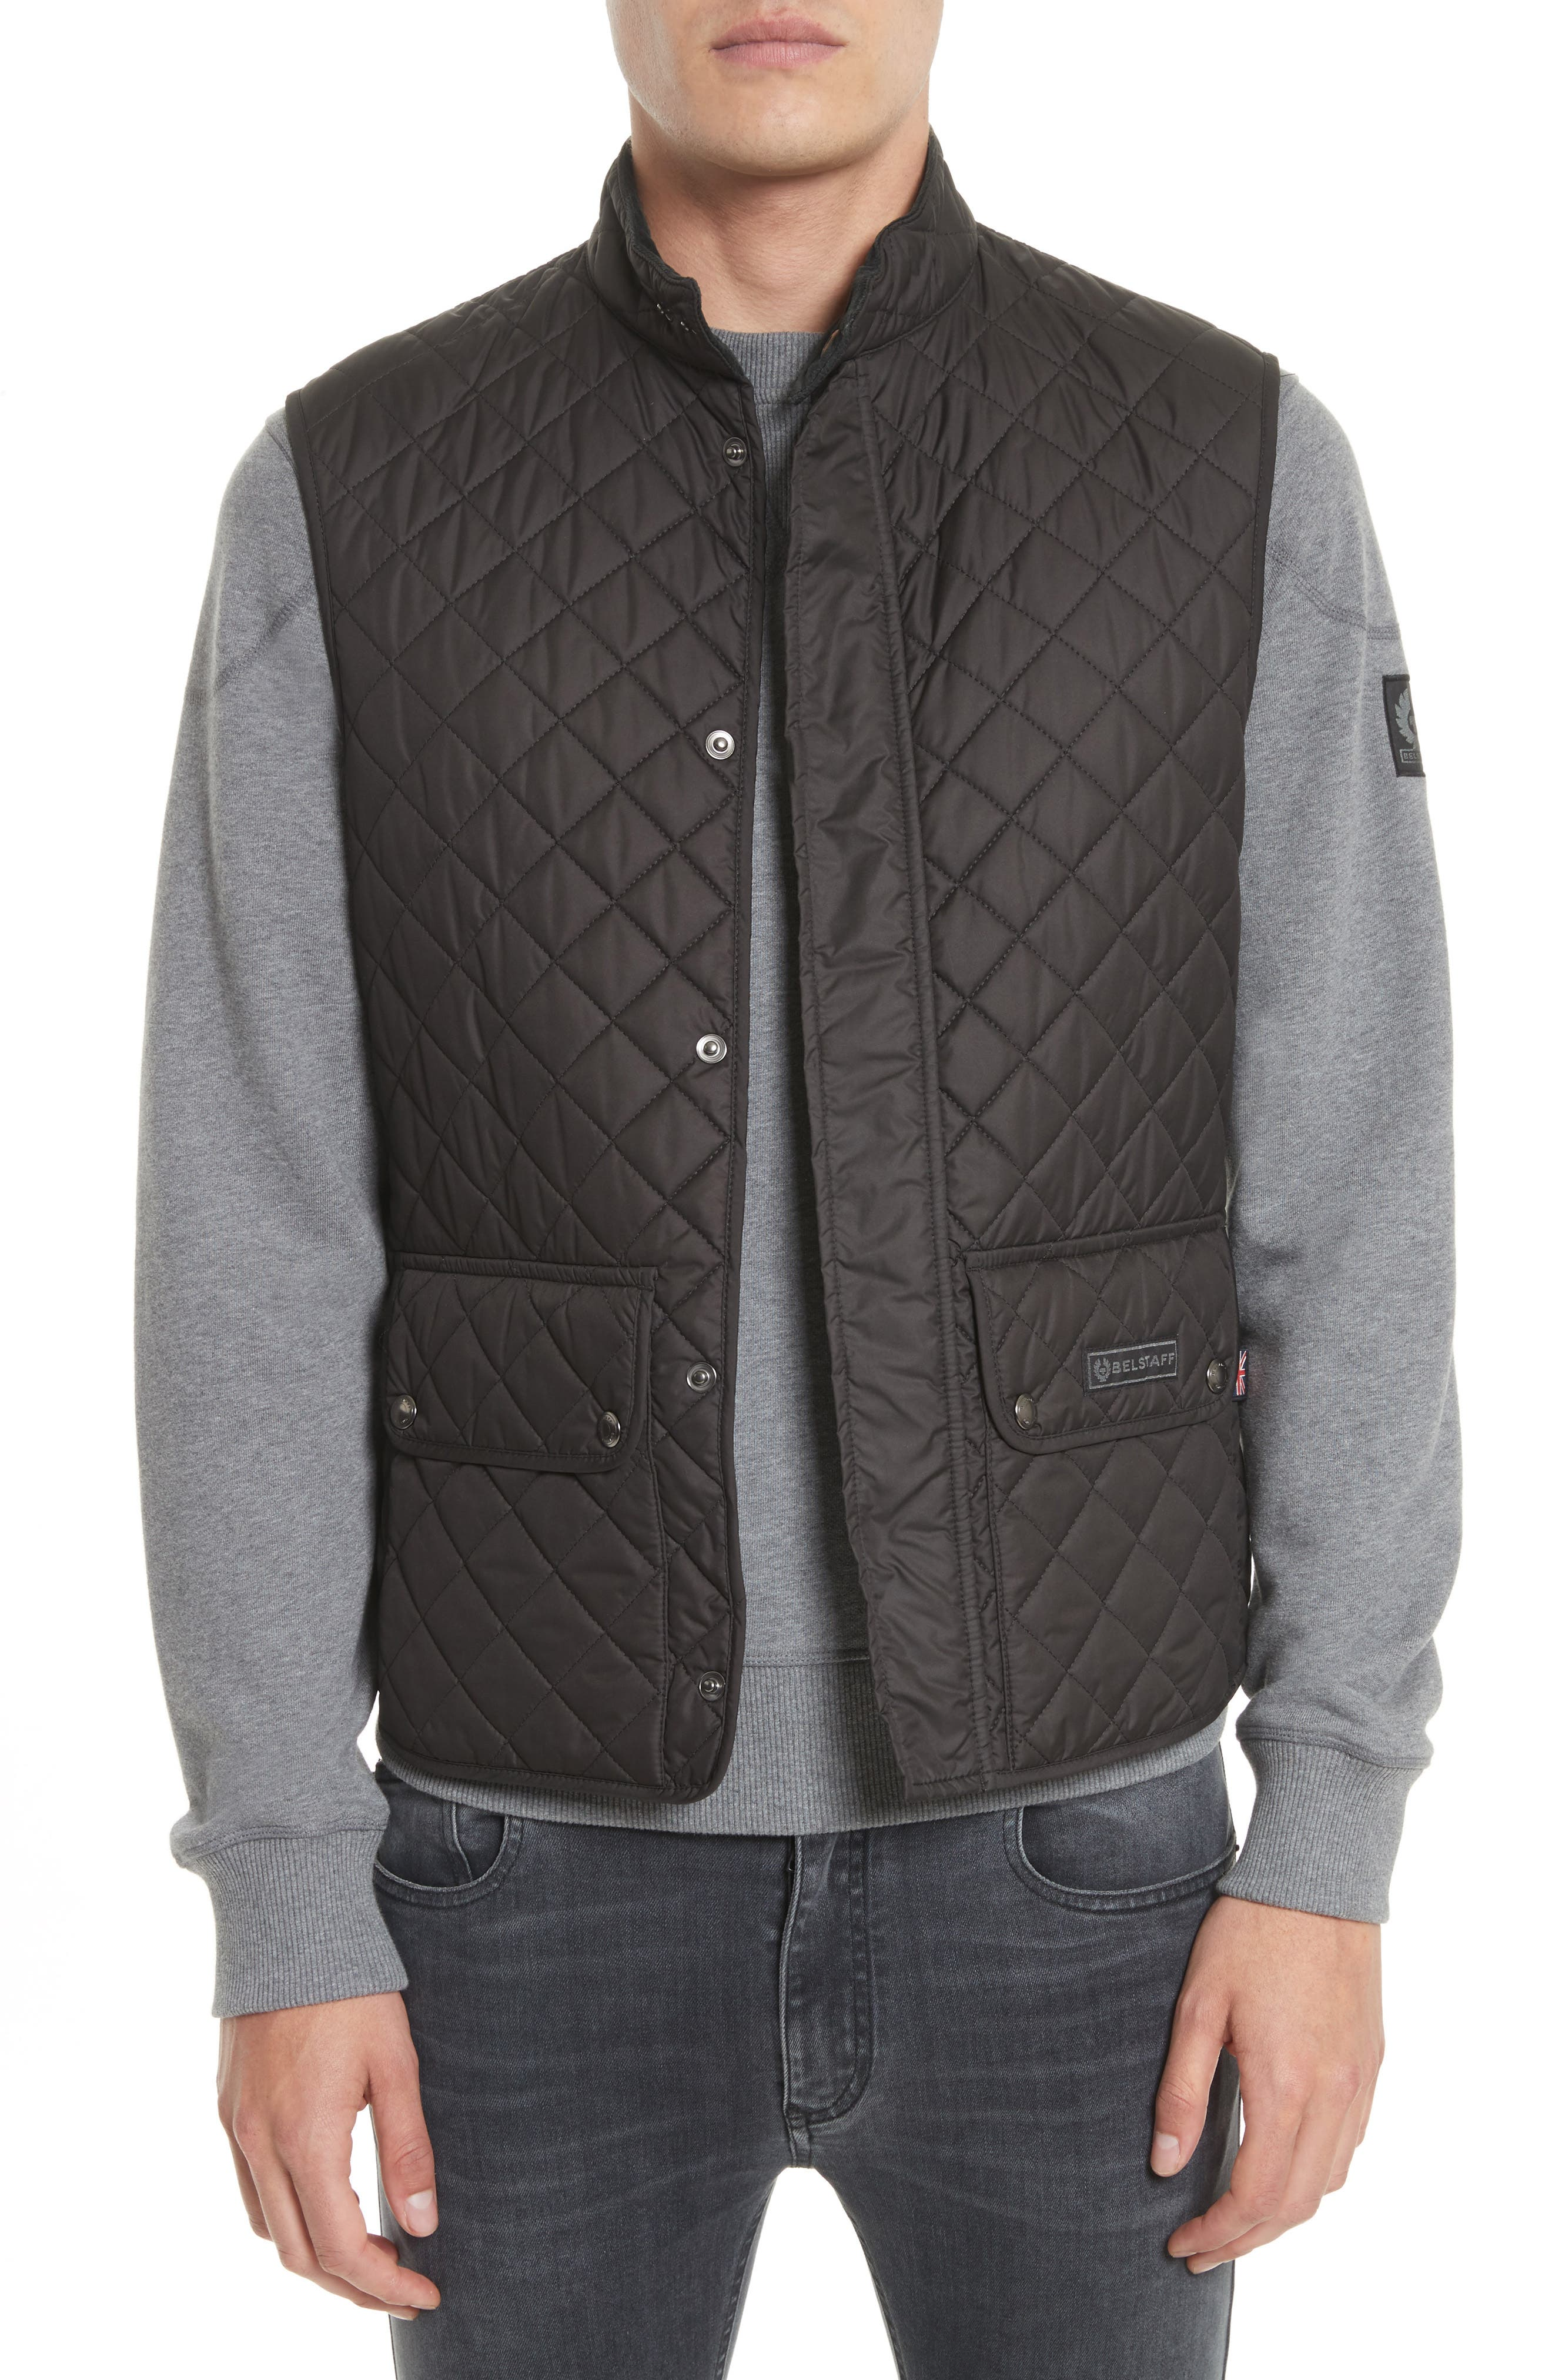 Waistcoat Tech Quilted Vest,                             Main thumbnail 1, color,                             Black